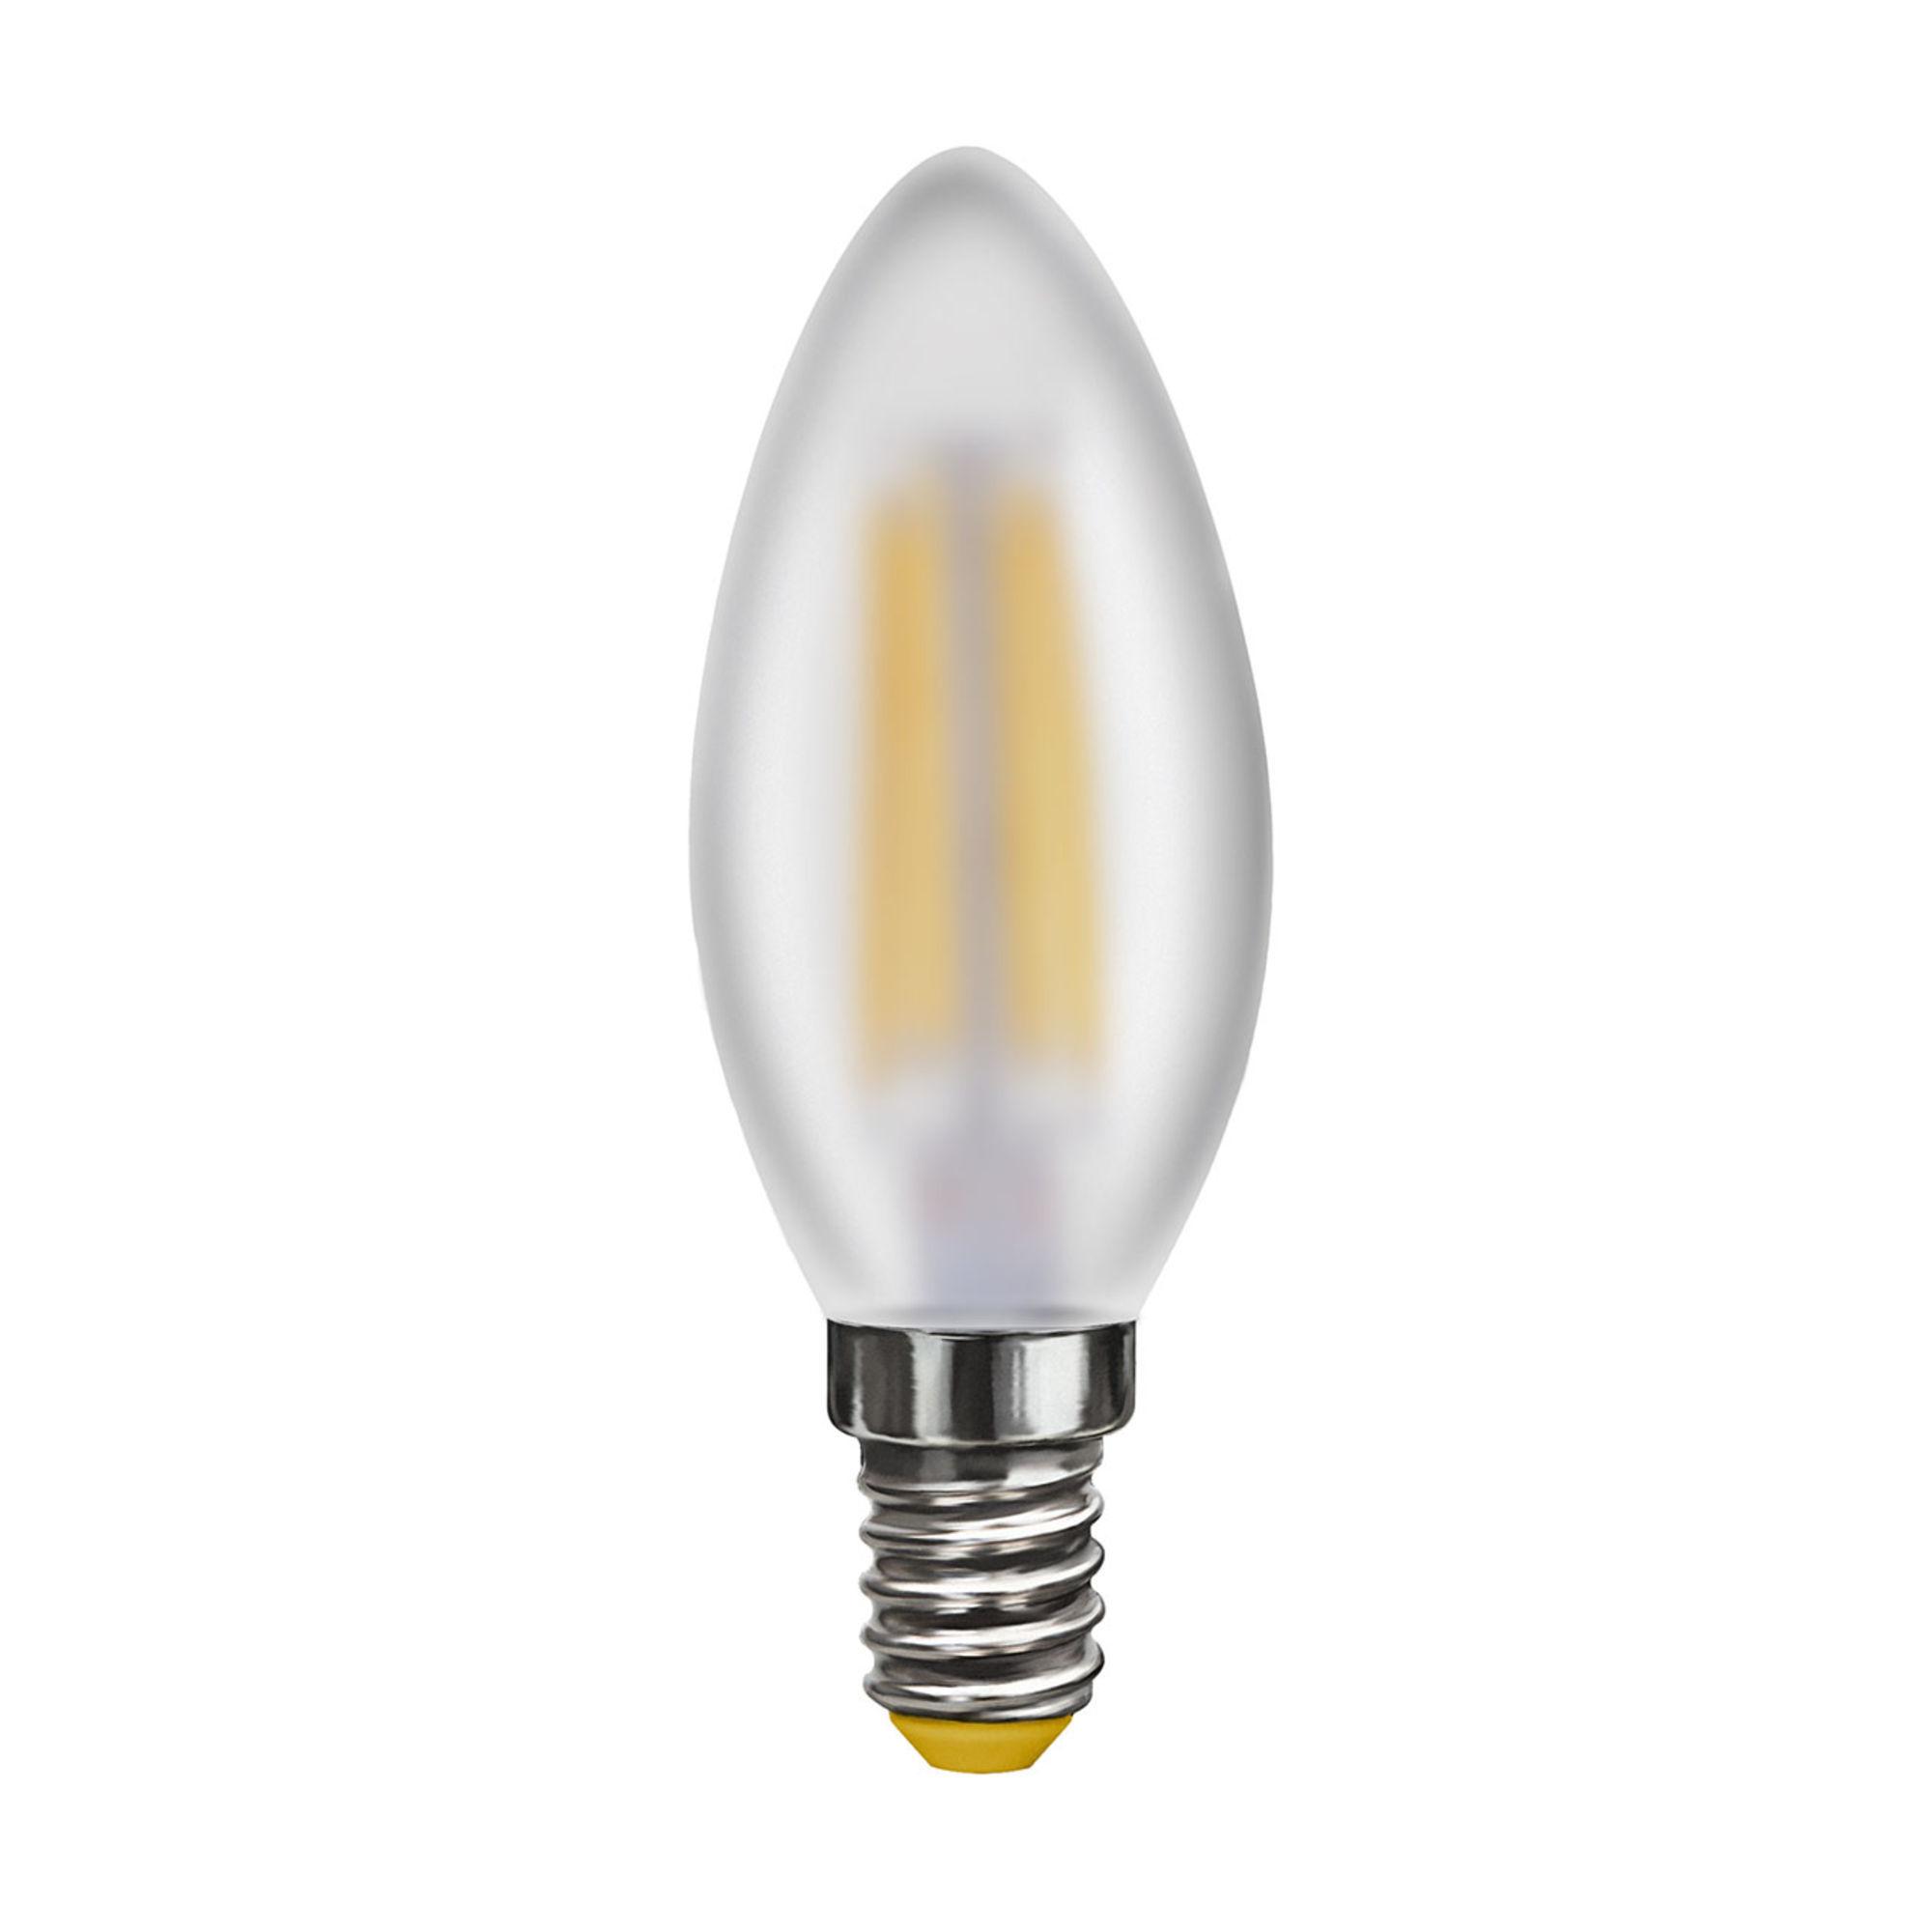 Филаментная светодиодная лампа Voltega Crystal 7045 свеча E14 6W, 4000K 220V, гарантия 3 года - фото 1